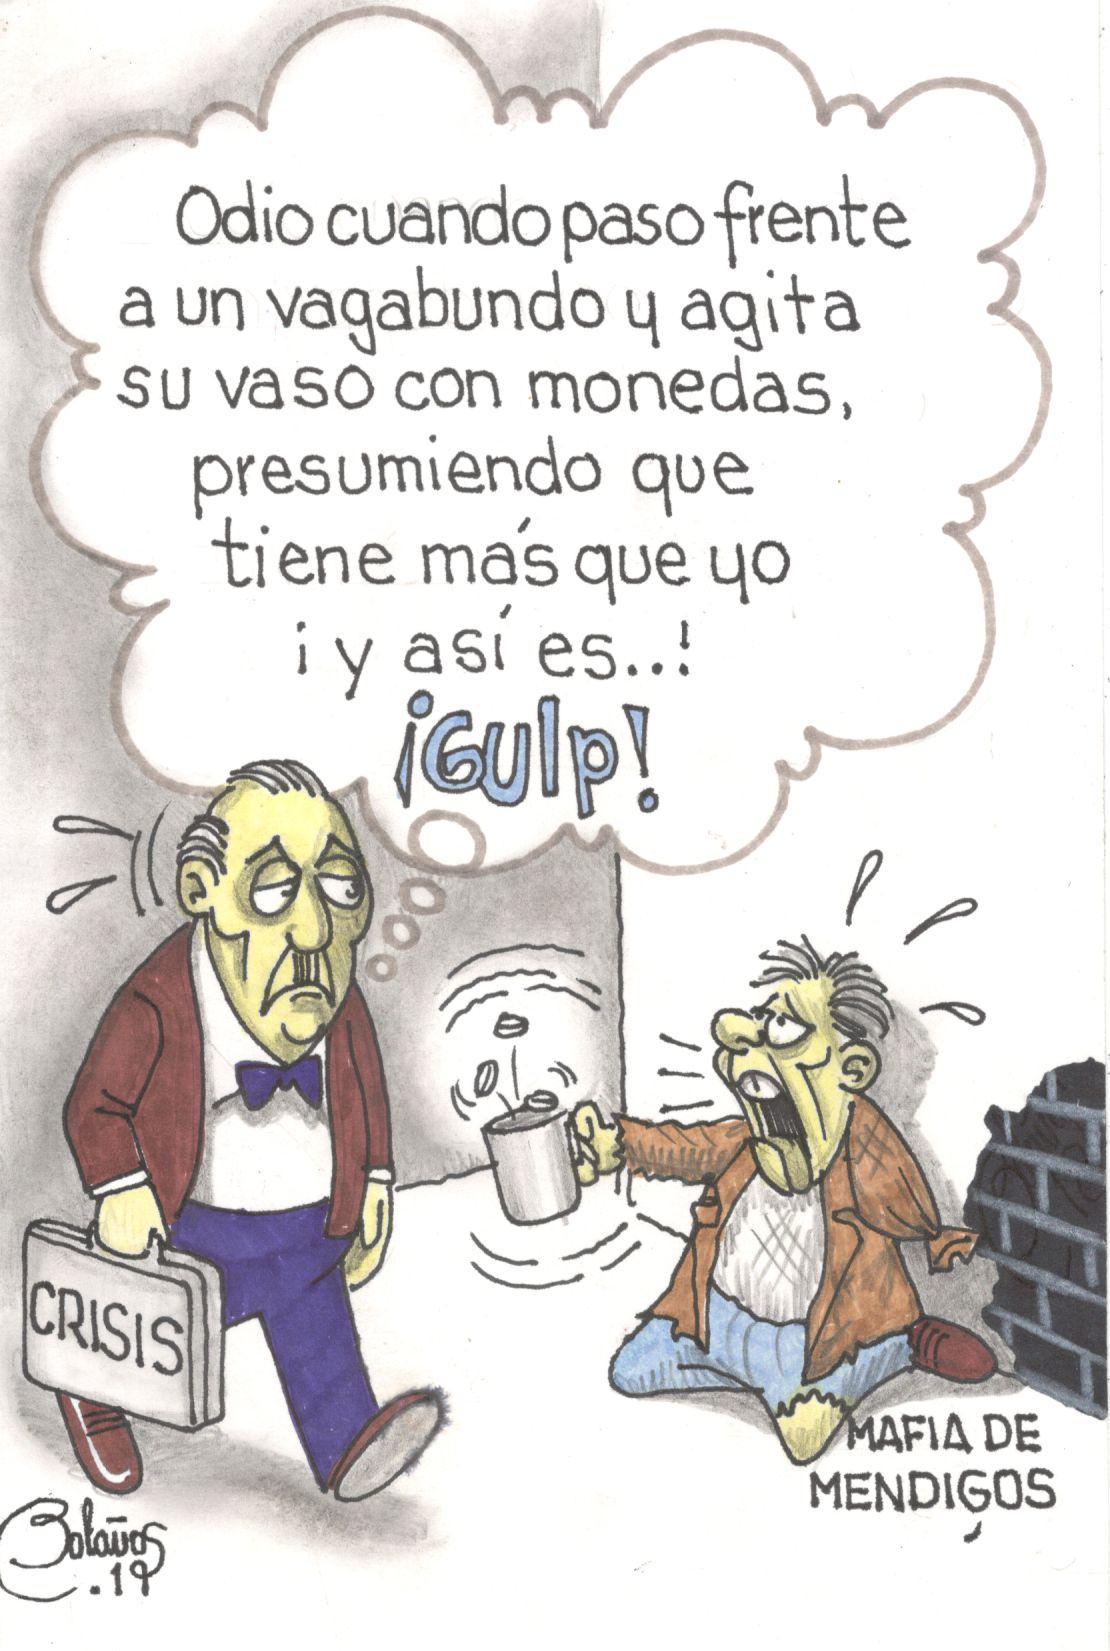 Mafia de mendigos | El Imparcial de Oaxaca